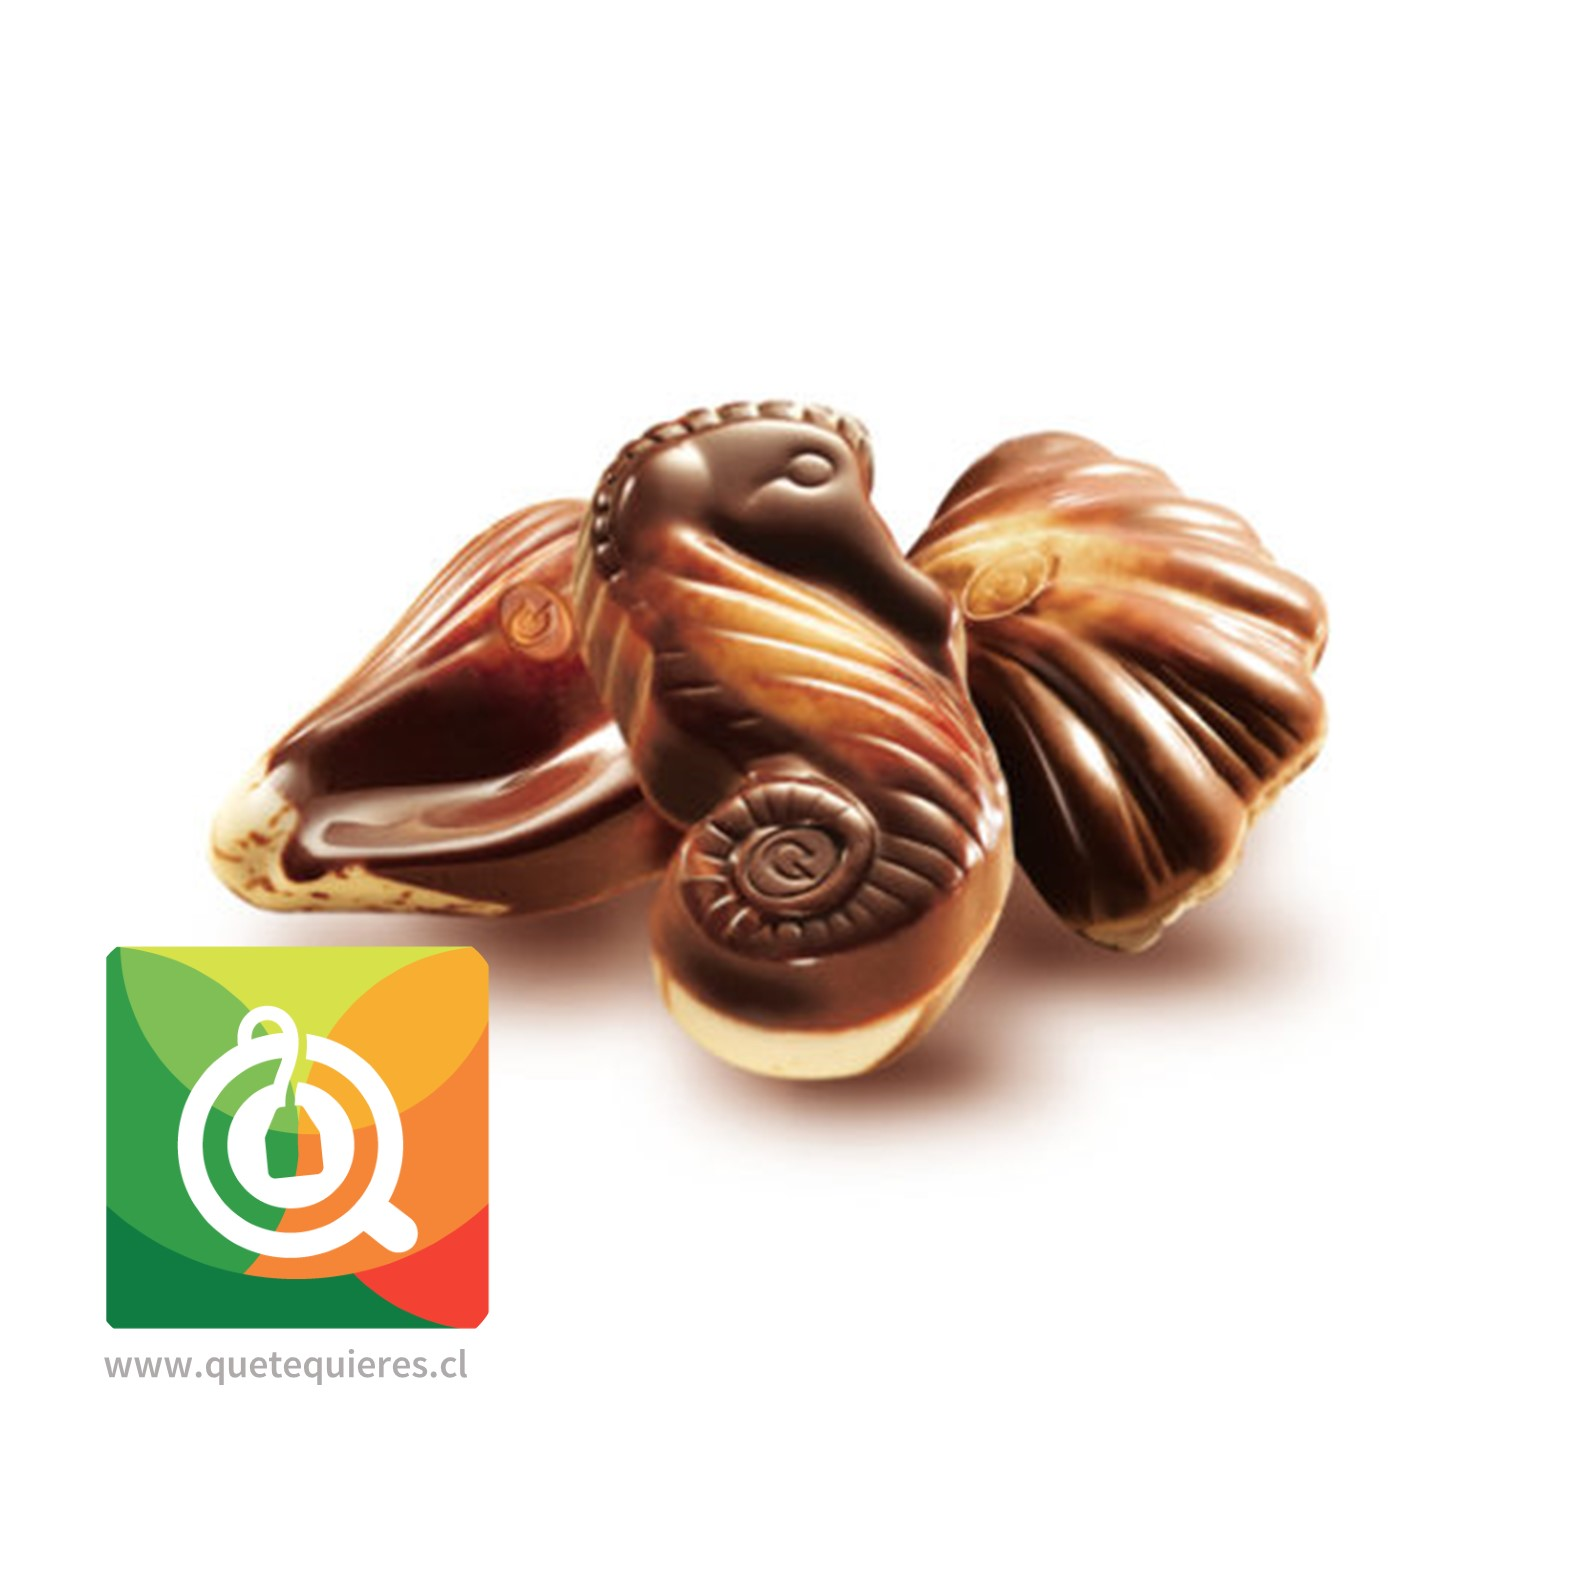 Guylian Bombon Chocolate SeaShell 125 gr - Image 2